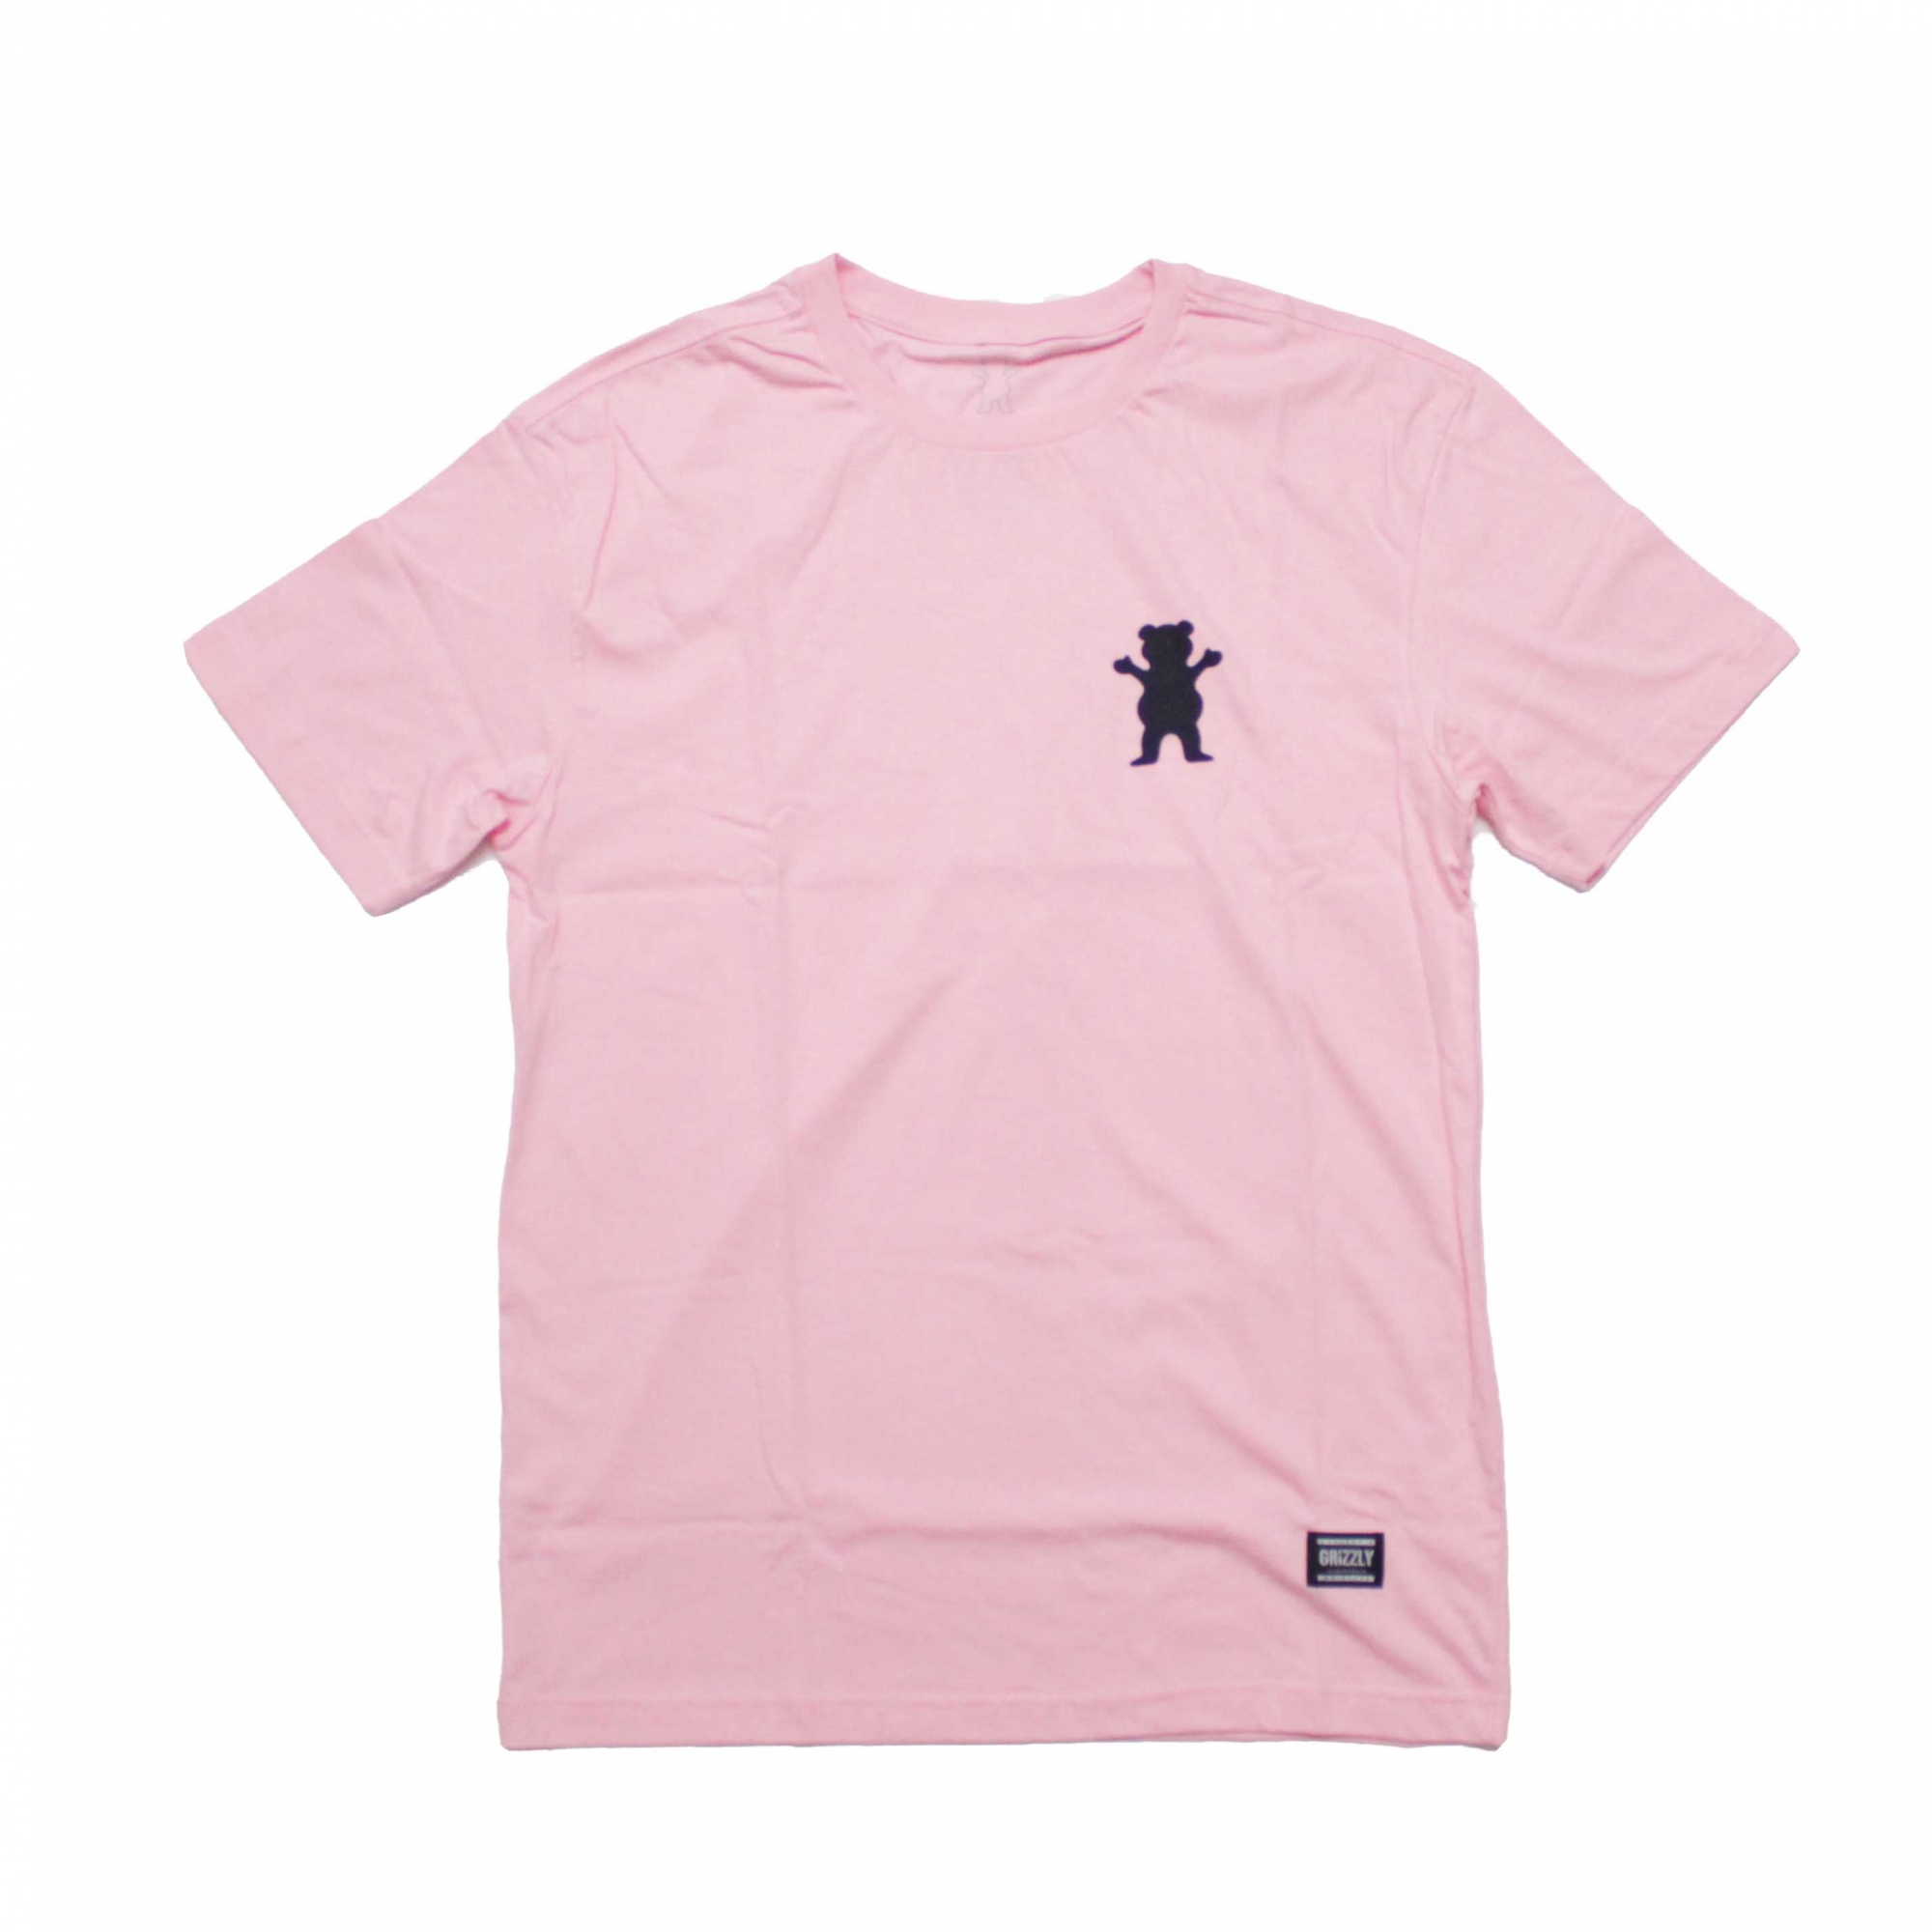 Camiseta Grizzly Mini Og Bear - Rosa/Preto